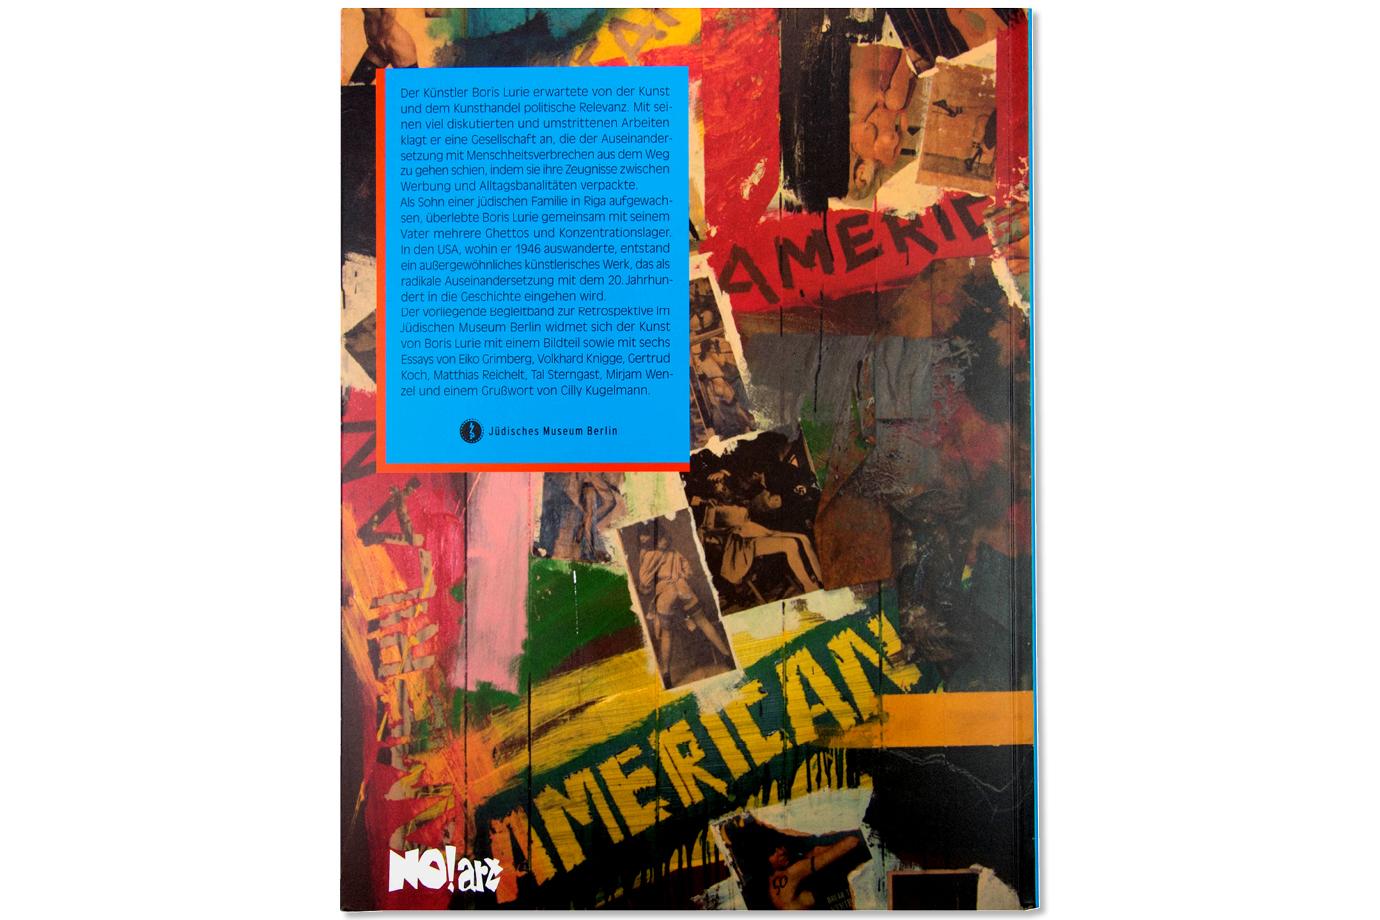 http://e-o-t.de/wordpress/wp-content/uploads/2017/03/Slide-Book_Lurie_9.jpg